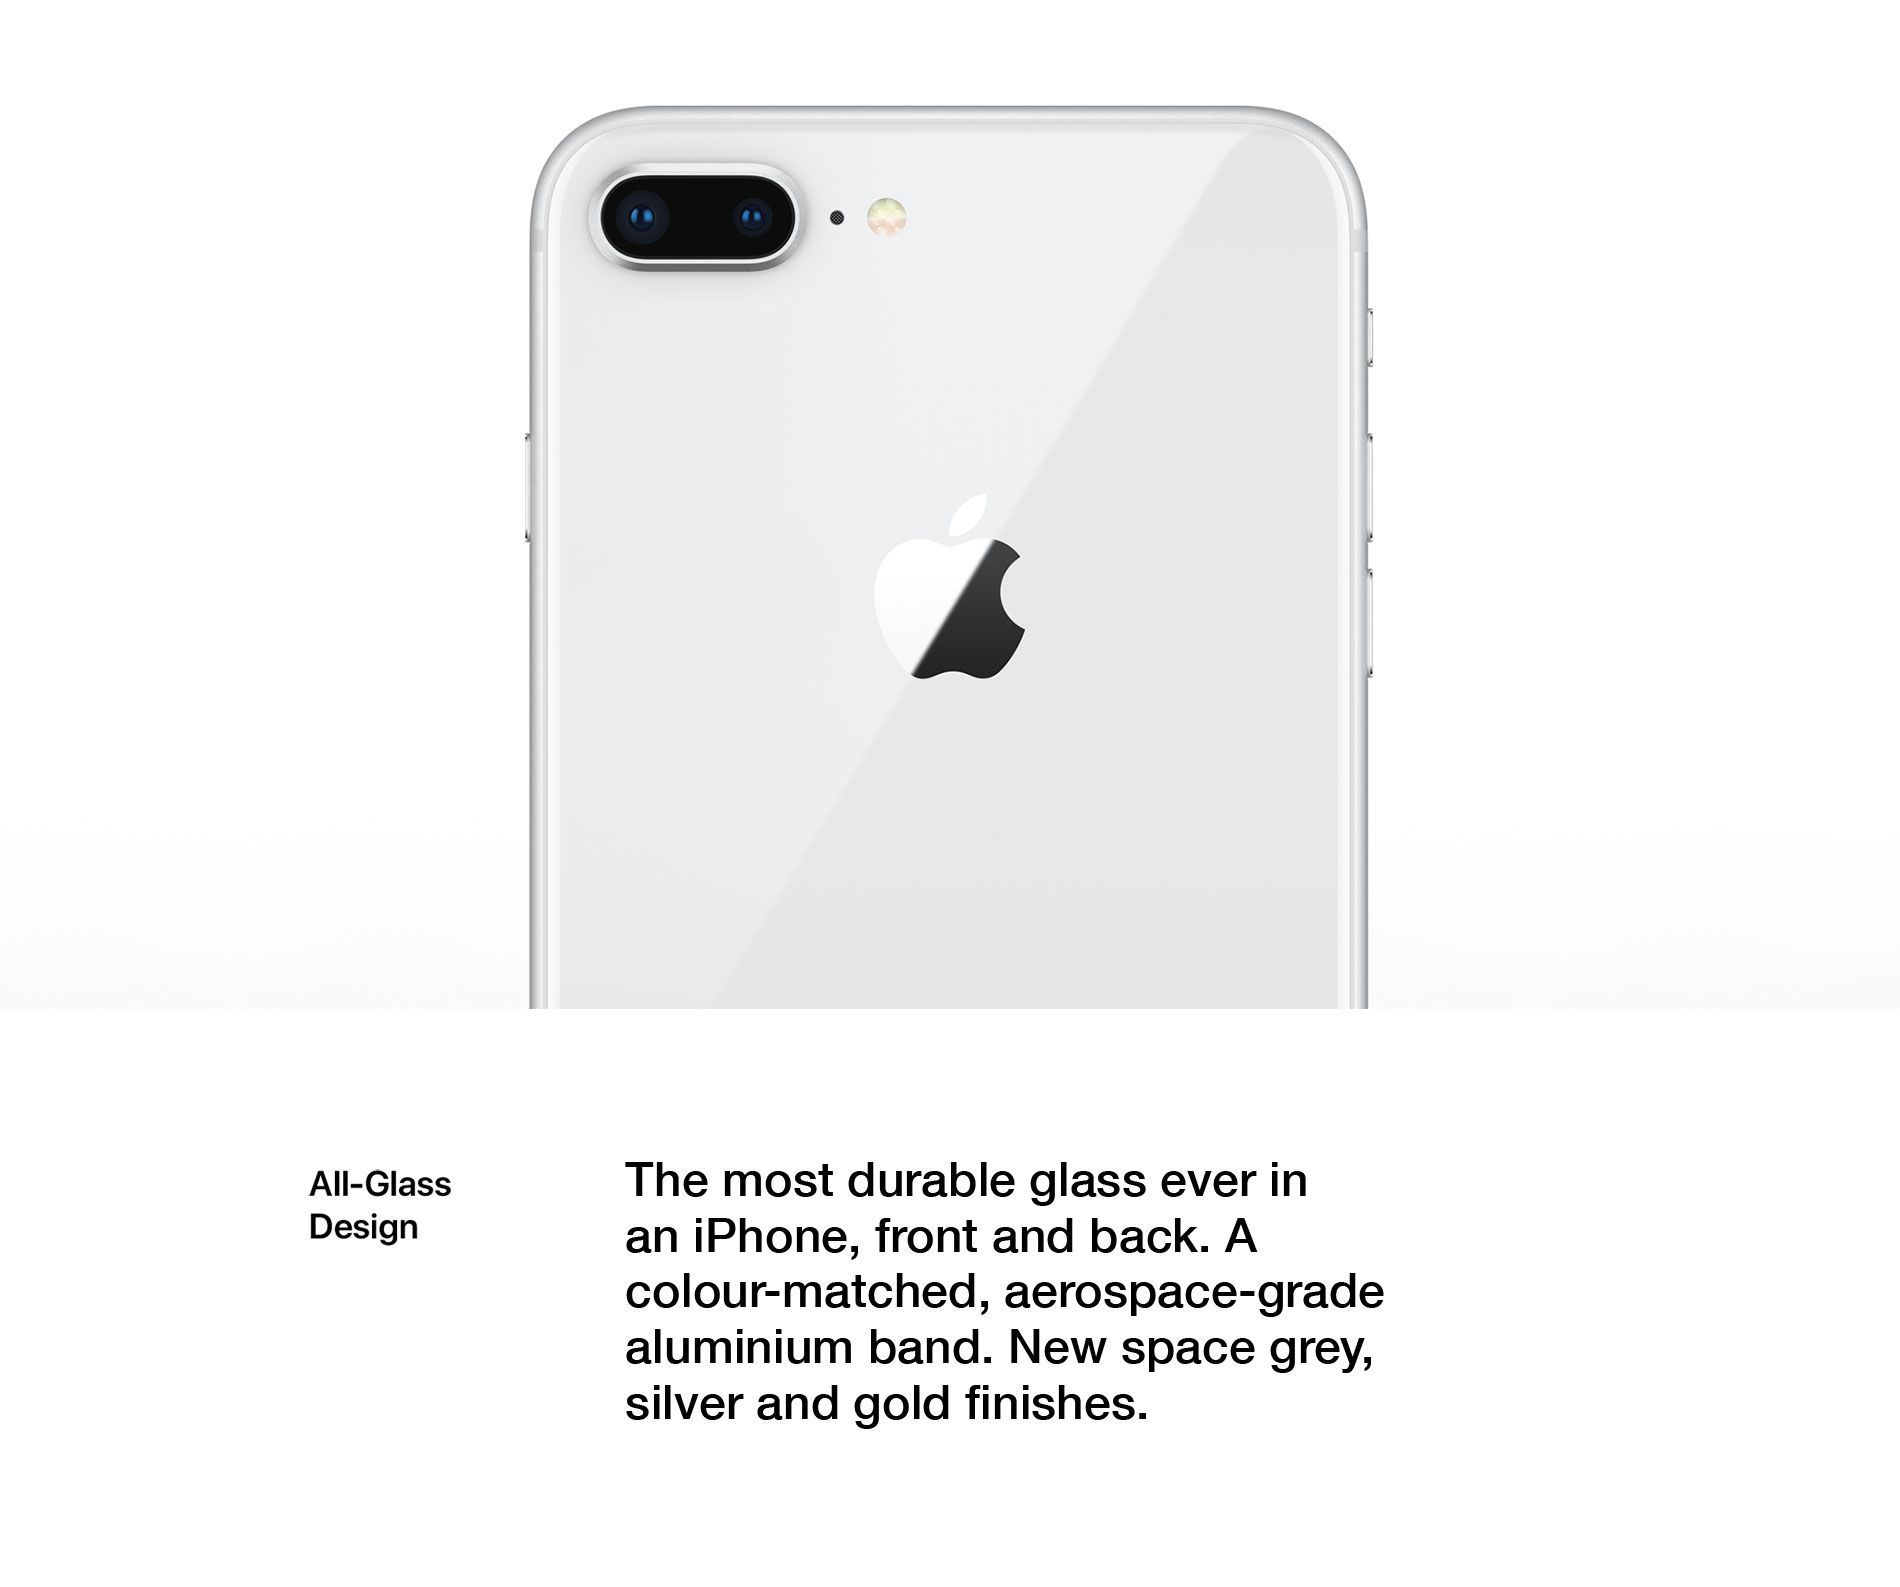 All-Glass Design